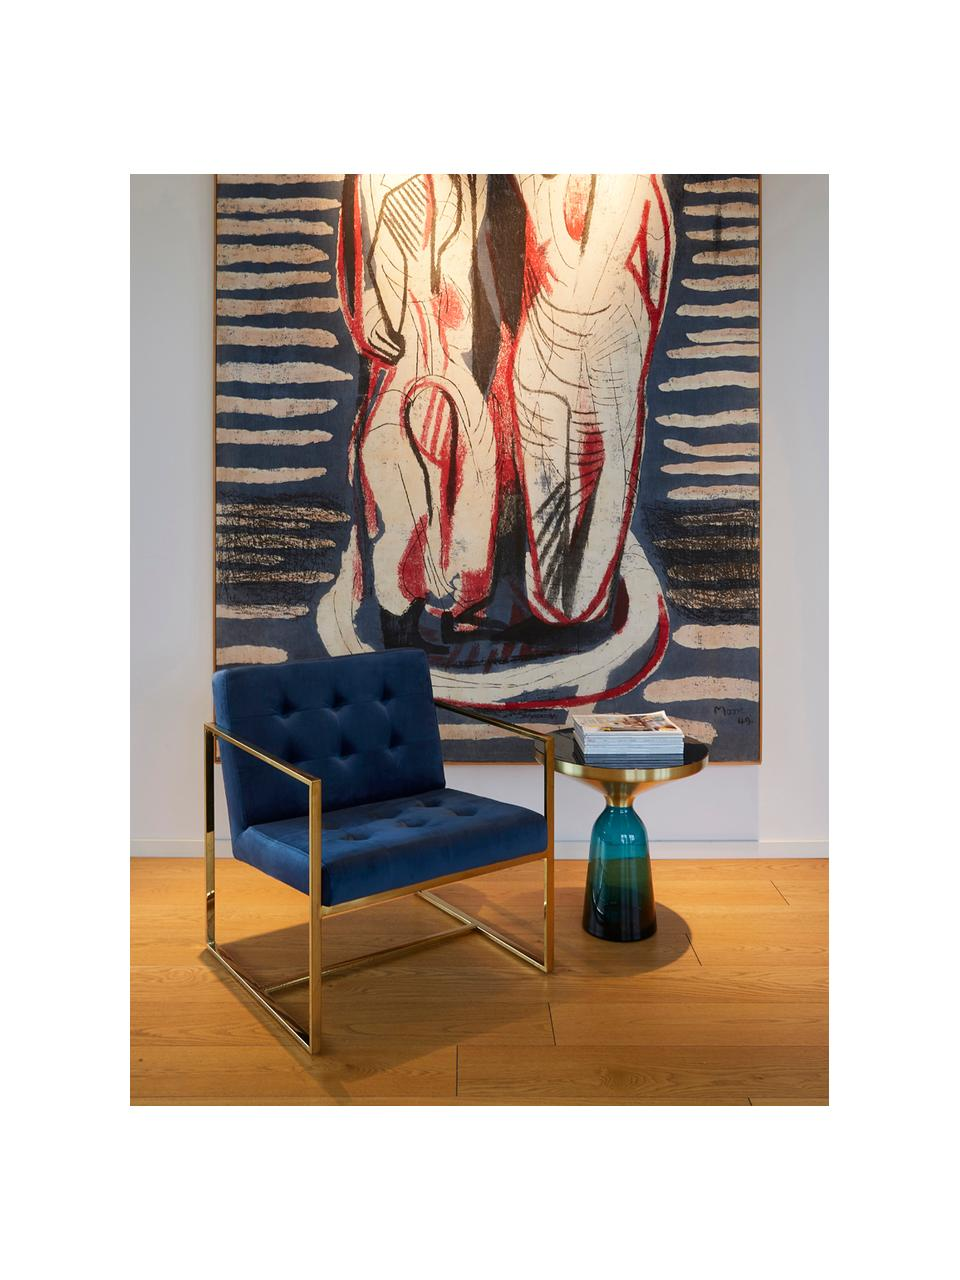 Fluwelen lounge fauteuil Manhattan in blauw, Bekleding: fluweel (polyester), Frame: gecoat metaal, Fluweel donkerblauw, B 70 x D 72 cm